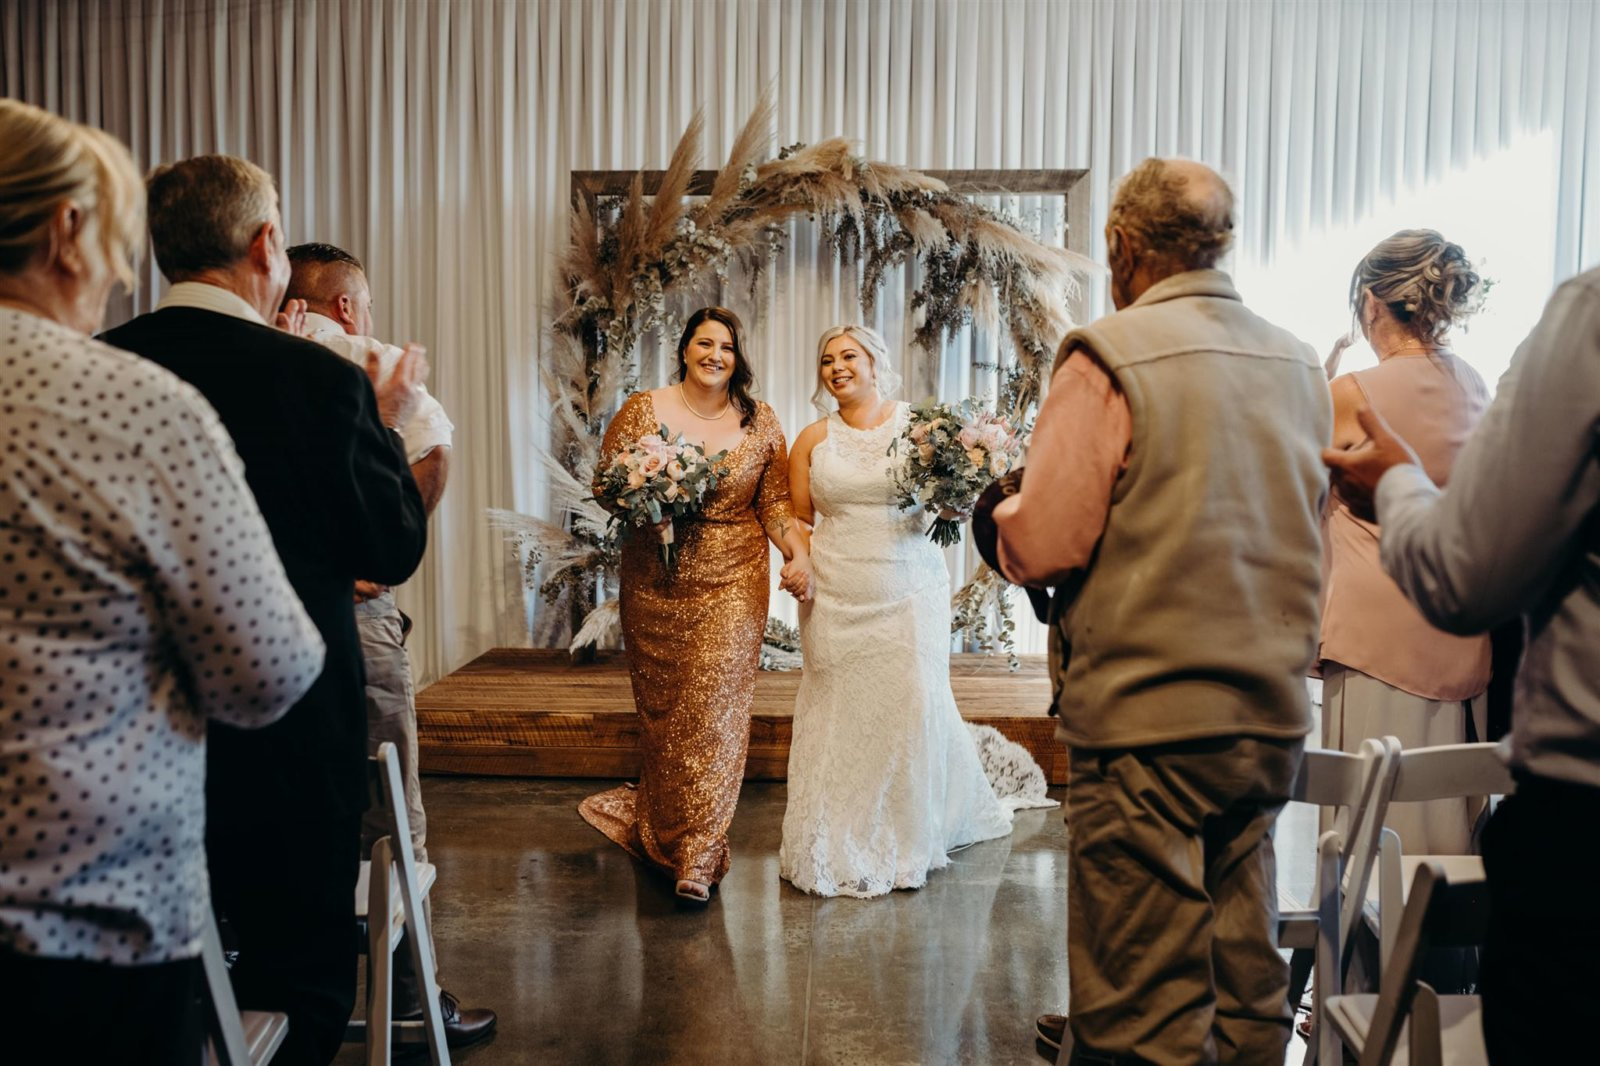 How to Walk Down the Wedding Aisle as a Same-Sex Couple - Lesbian Wedding Inspiration